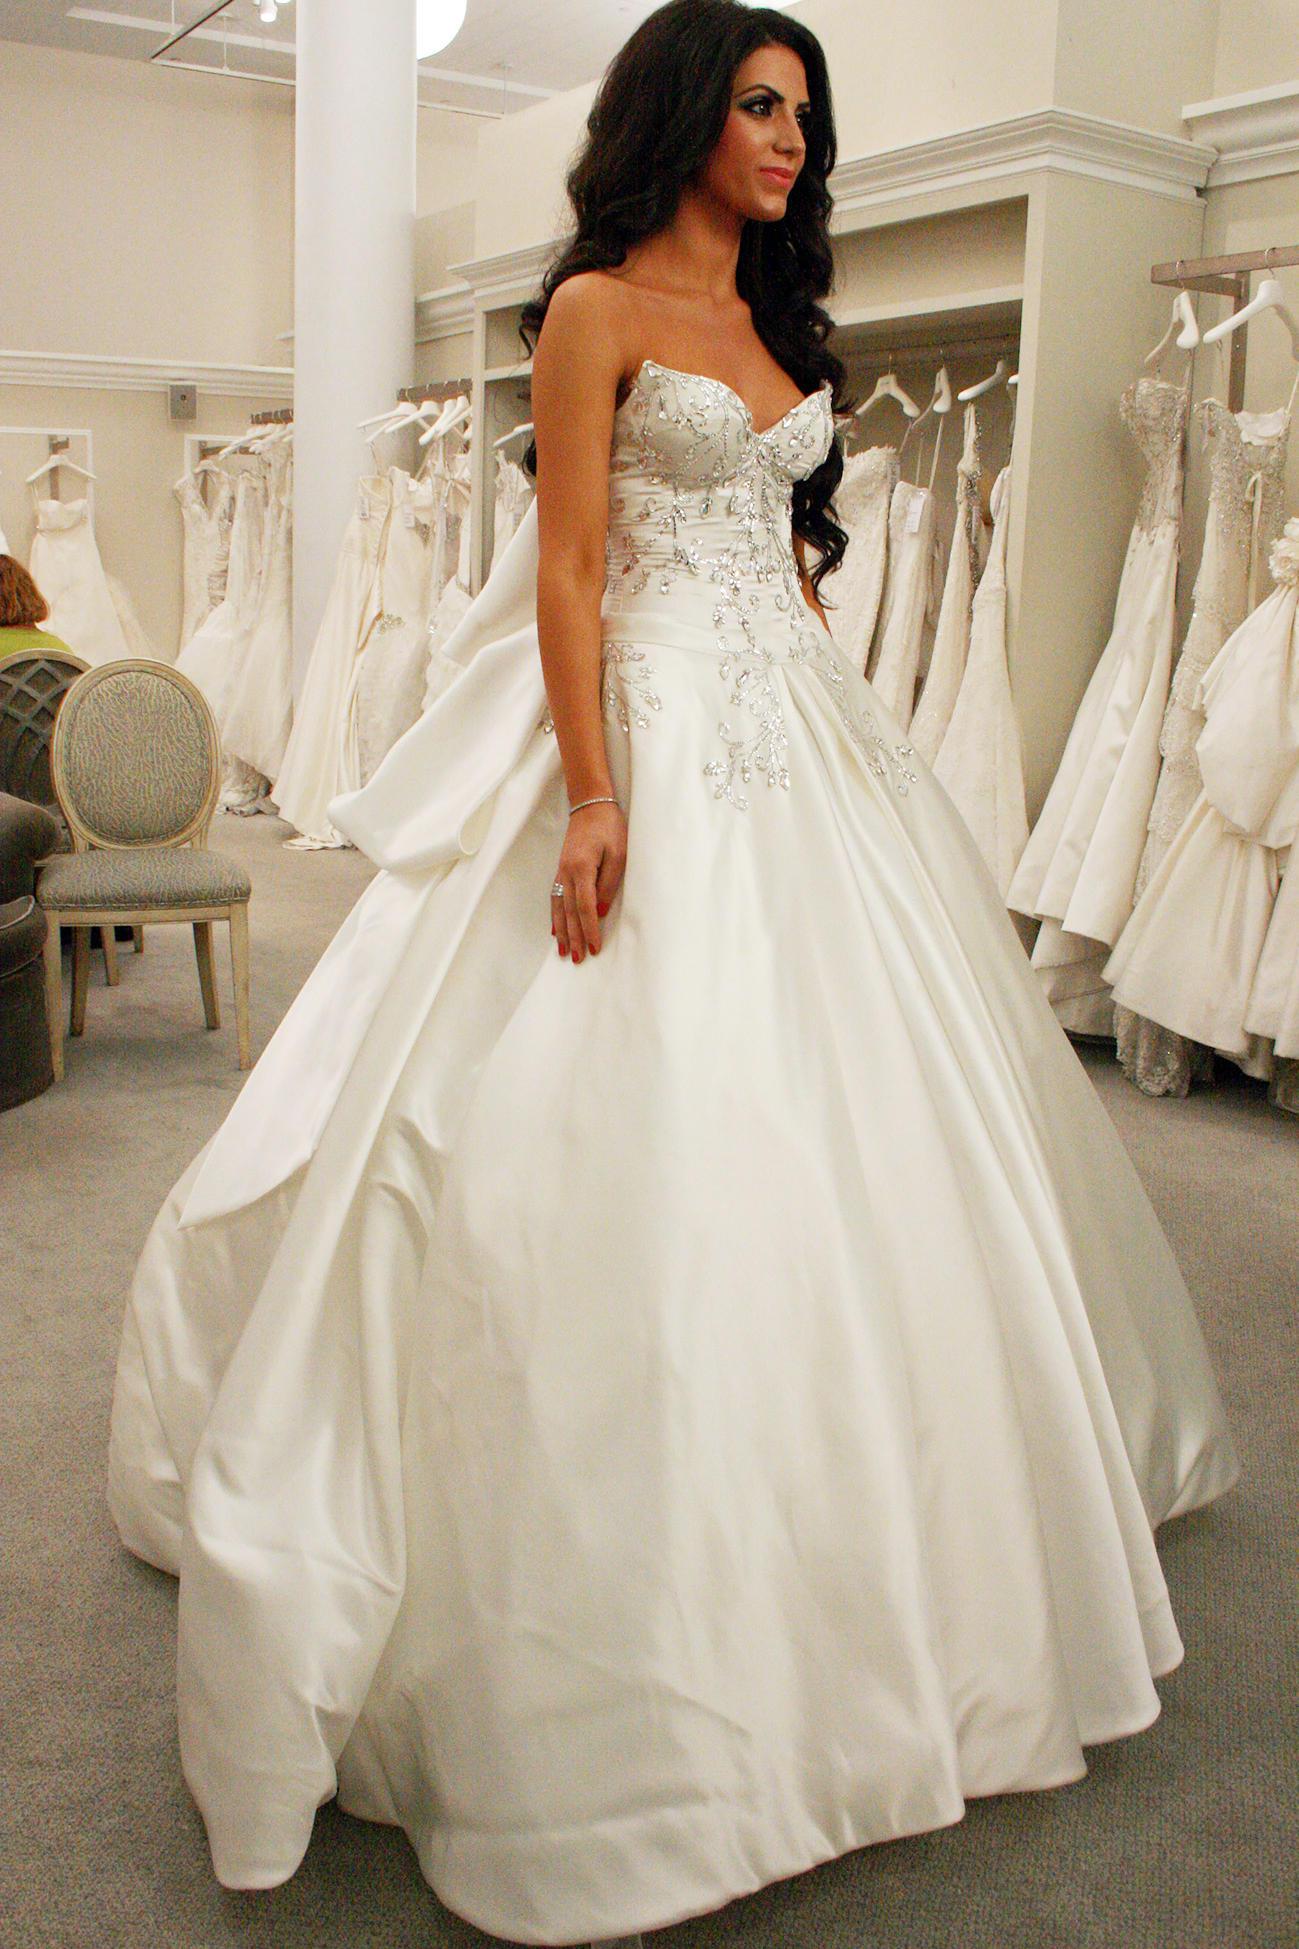 Season 11 Featured Wedding Dresses Part 10